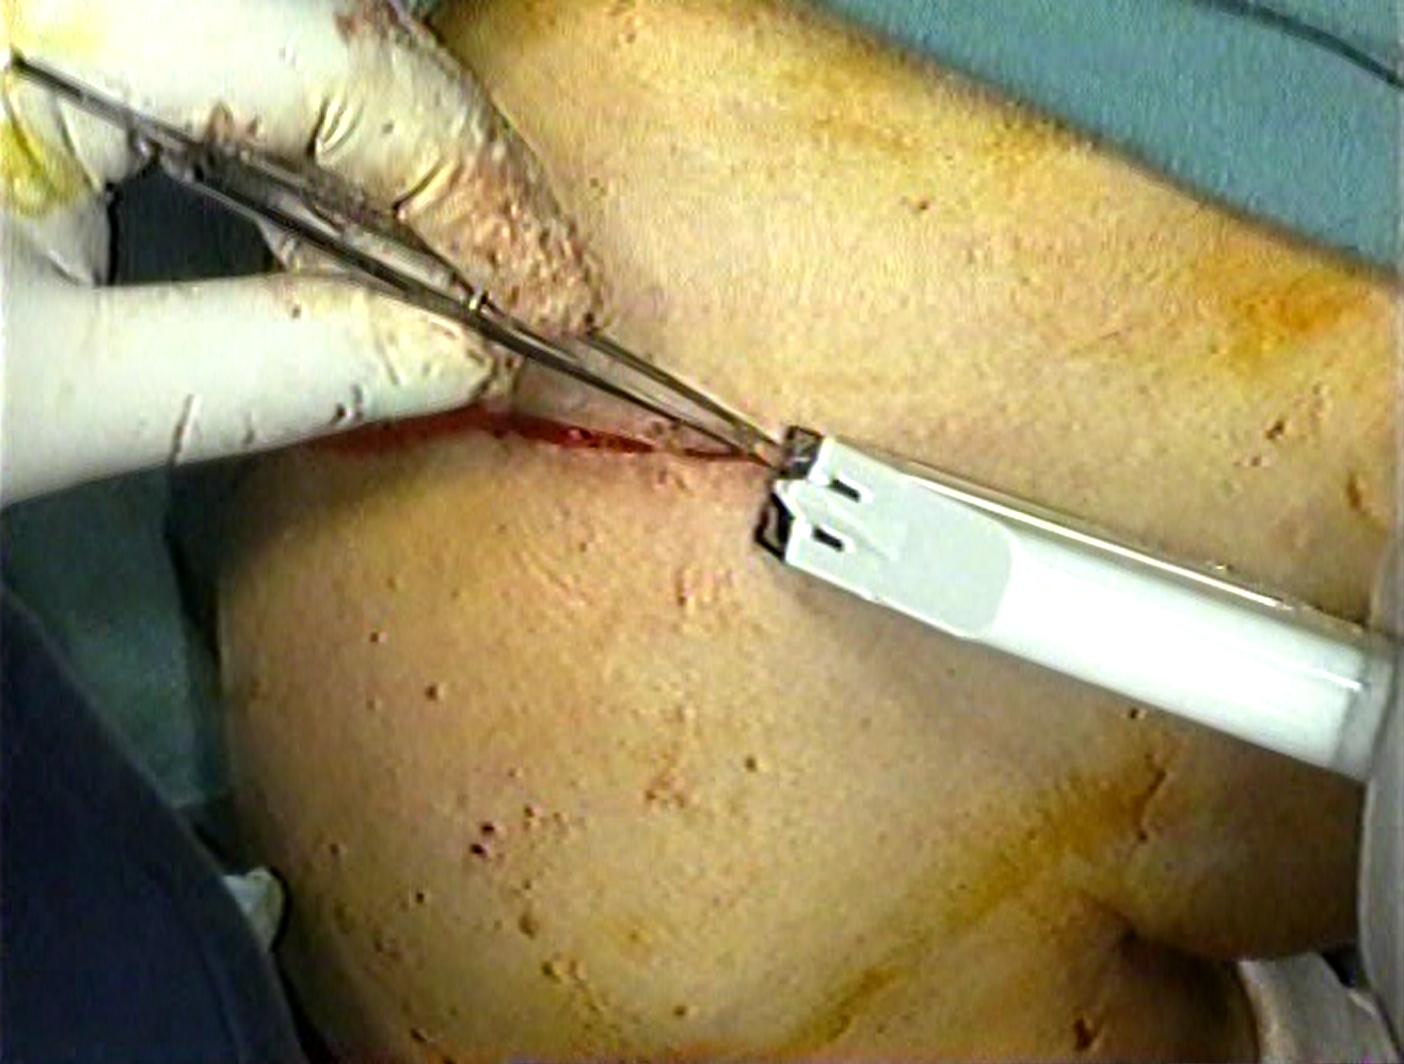 【閲覧注意】鎖骨外端骨折のオペ動画